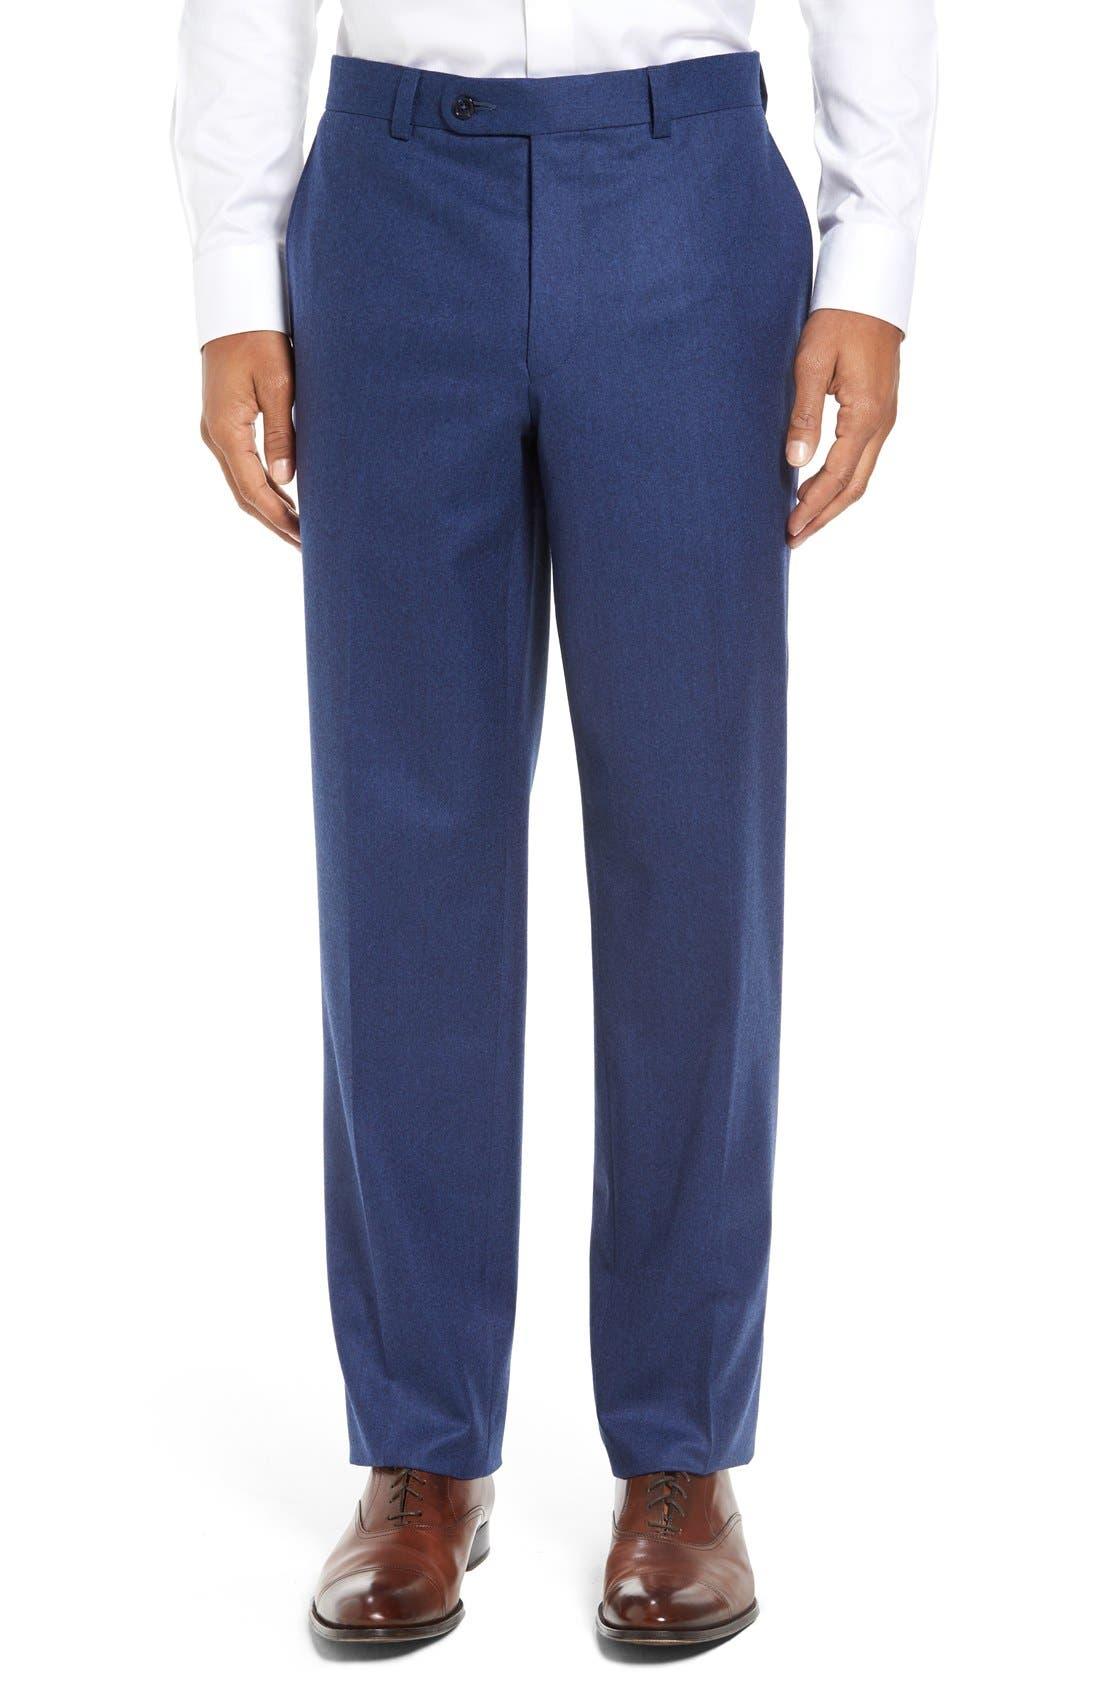 Alternate Image 1 Selected - David Donahue 'Ryan' Classic Fit Trousers